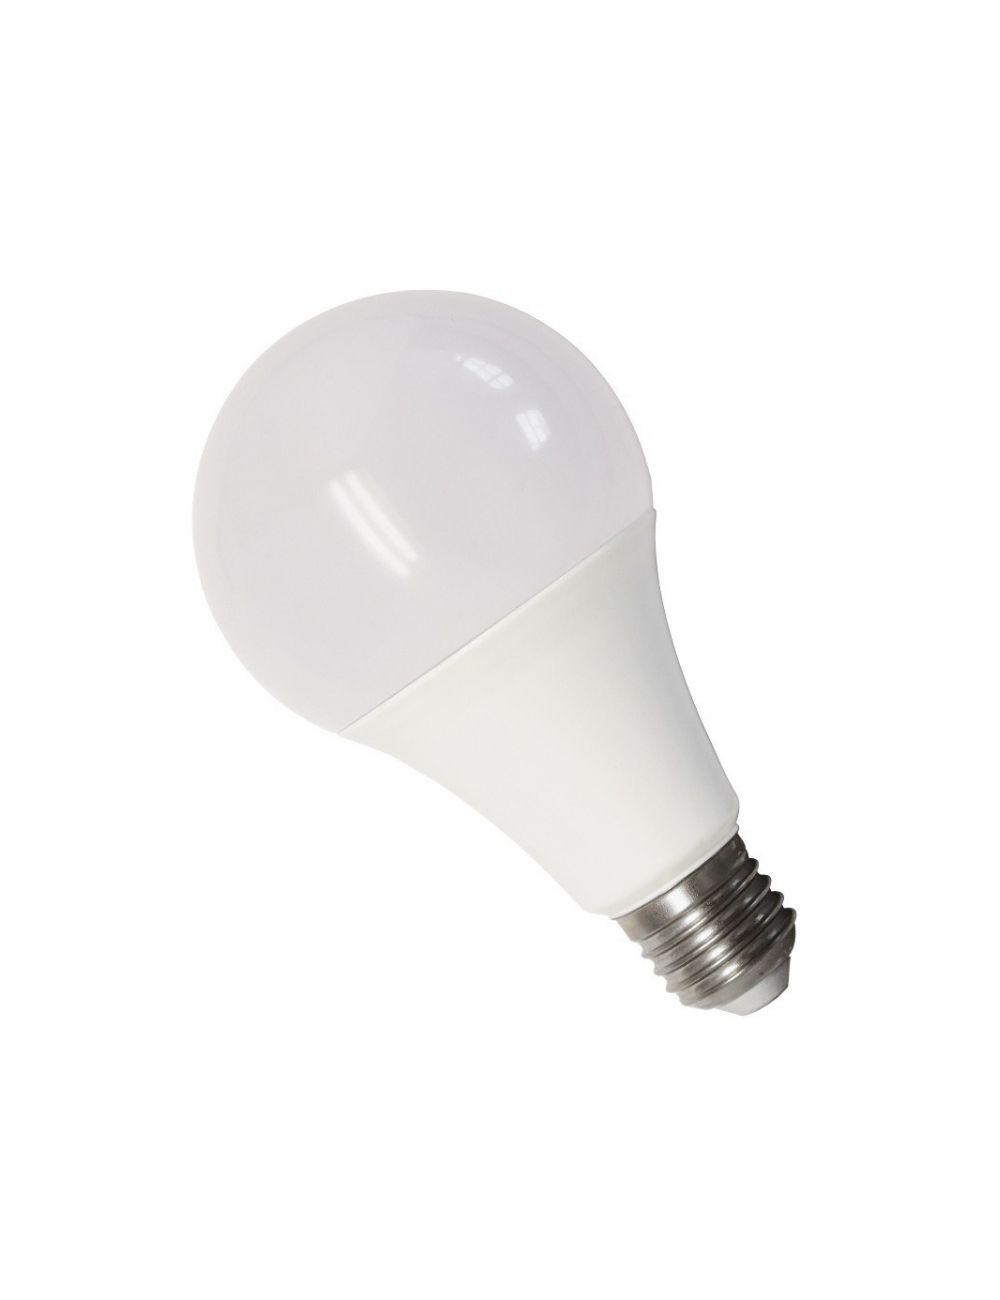 ŻARÓWKA LED A60/270º E27 11W CIEPŁA